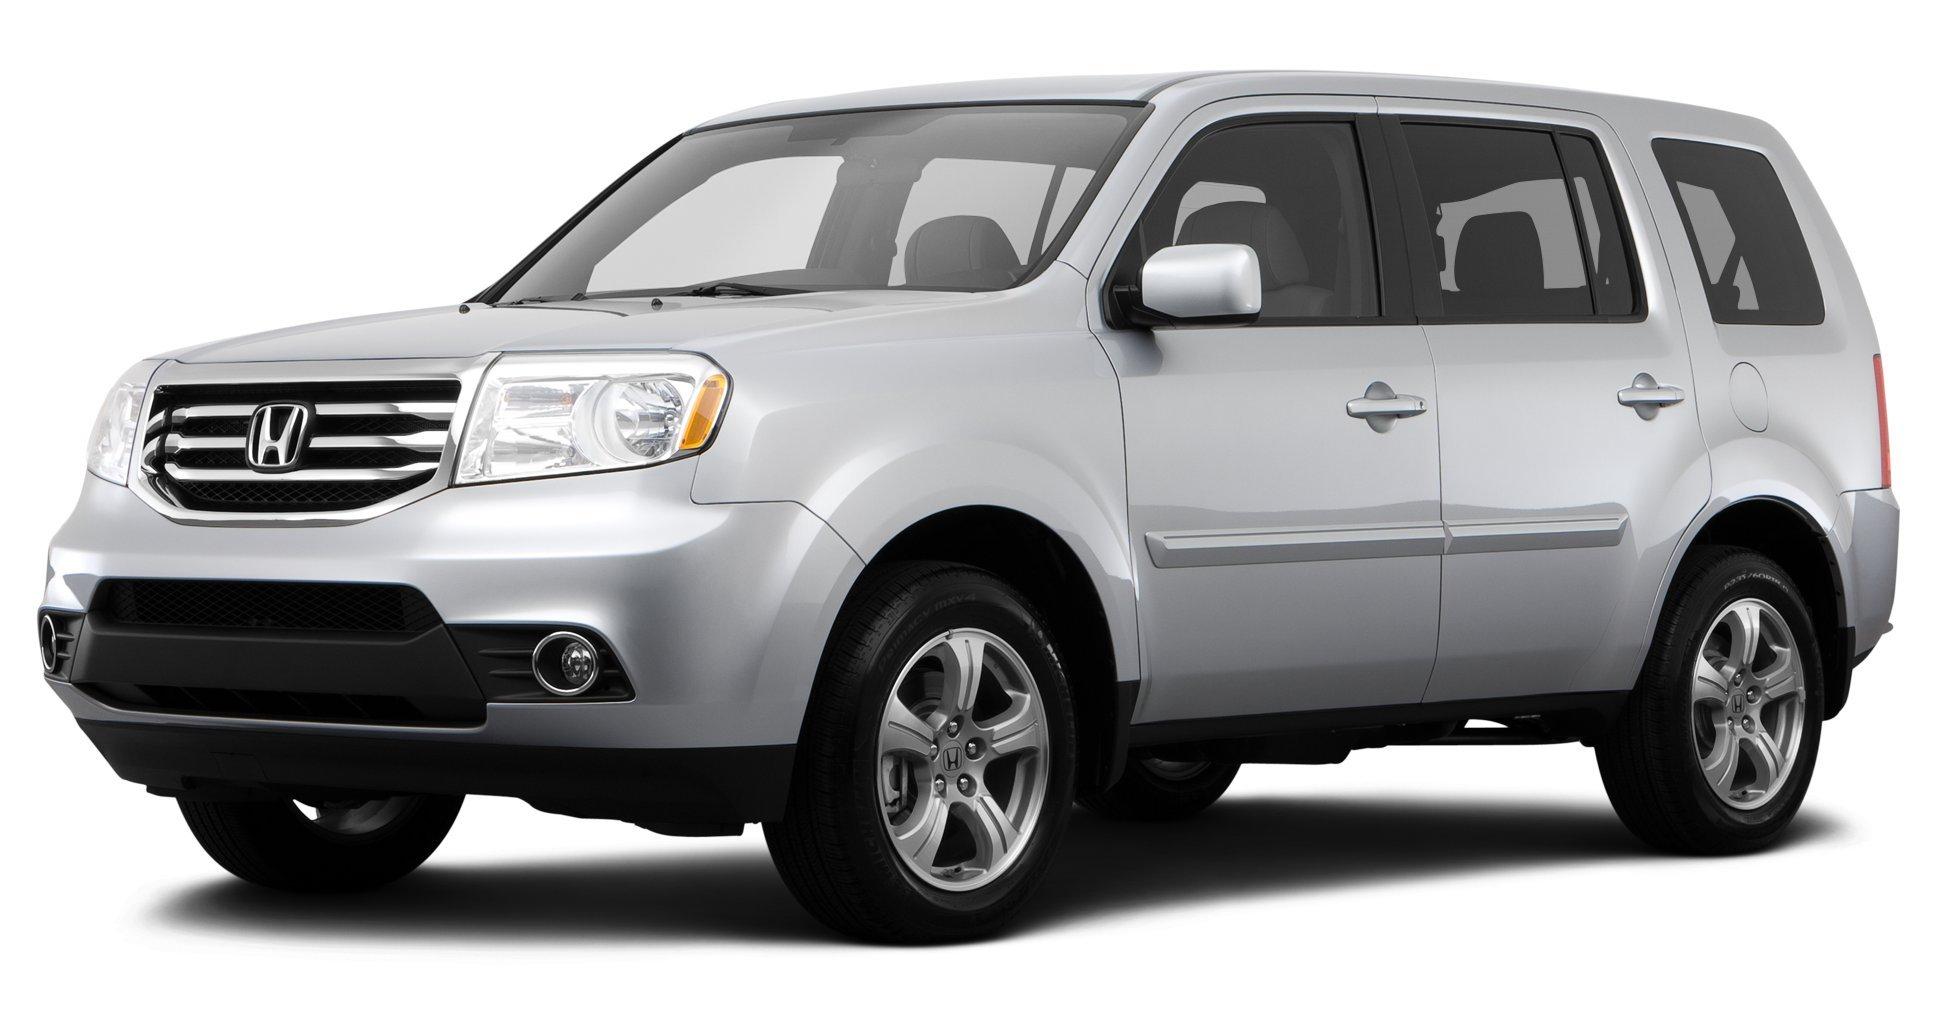 Amazon.com: 2014 Honda Pilot Reviews, Images, and Specs: Vehicles